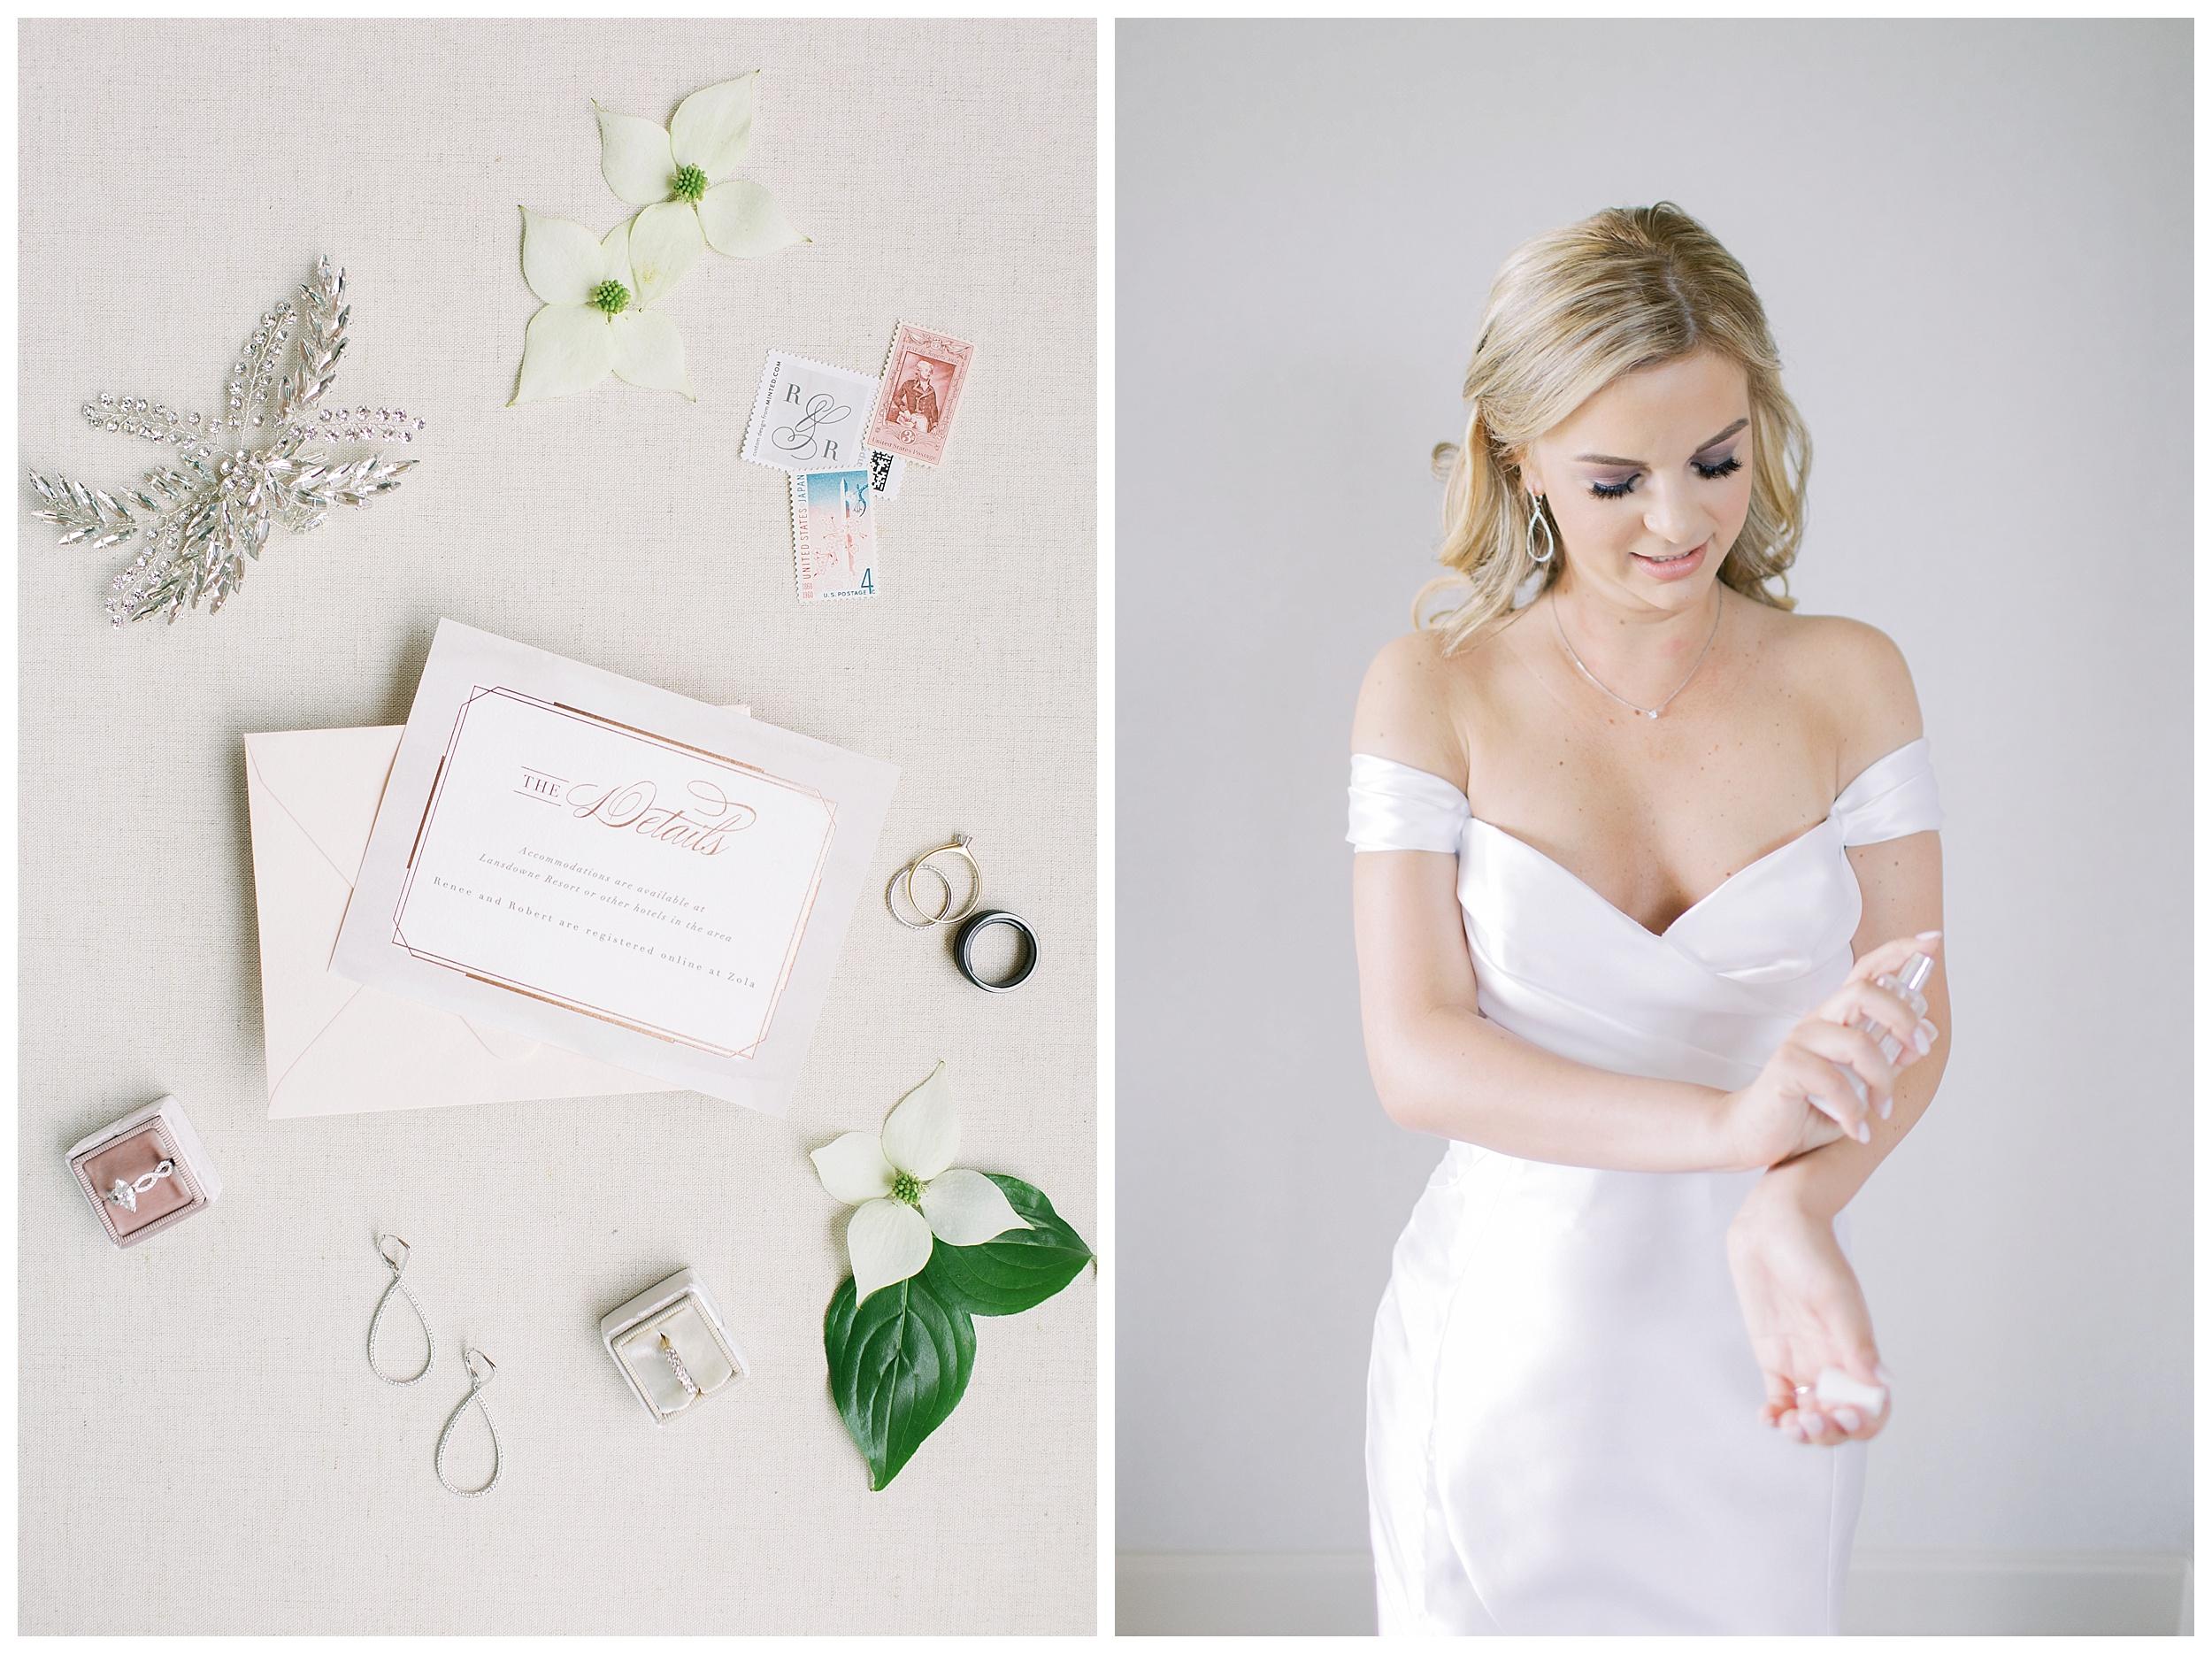 Lansdowne Resort Wedding | Virginia Film Wedding Photographer Kir Tuben_0018.jpg